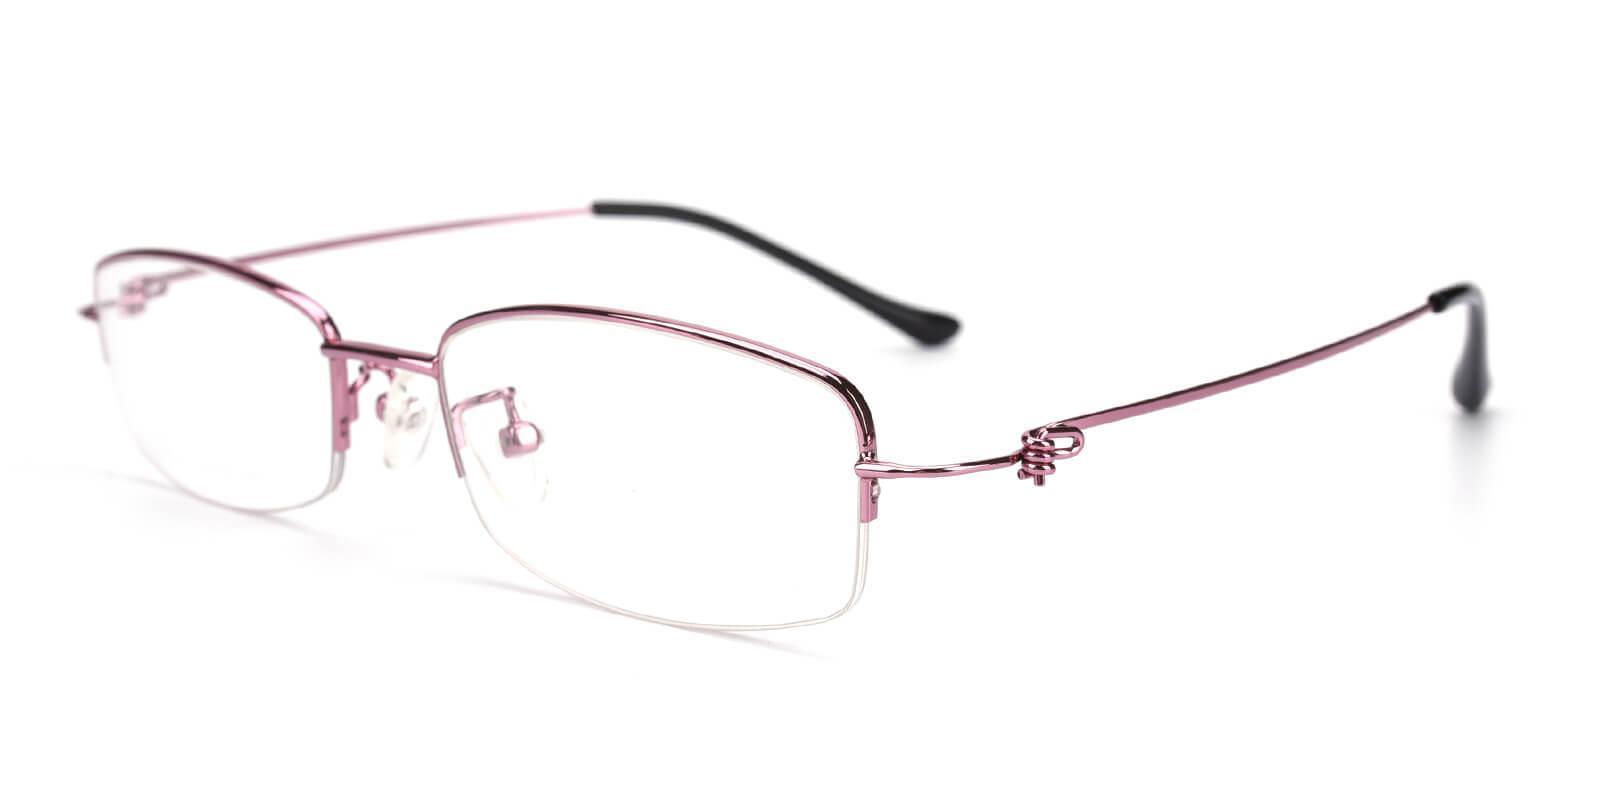 Elise-Pink-Rectangle-Metal-Eyeglasses-additional1